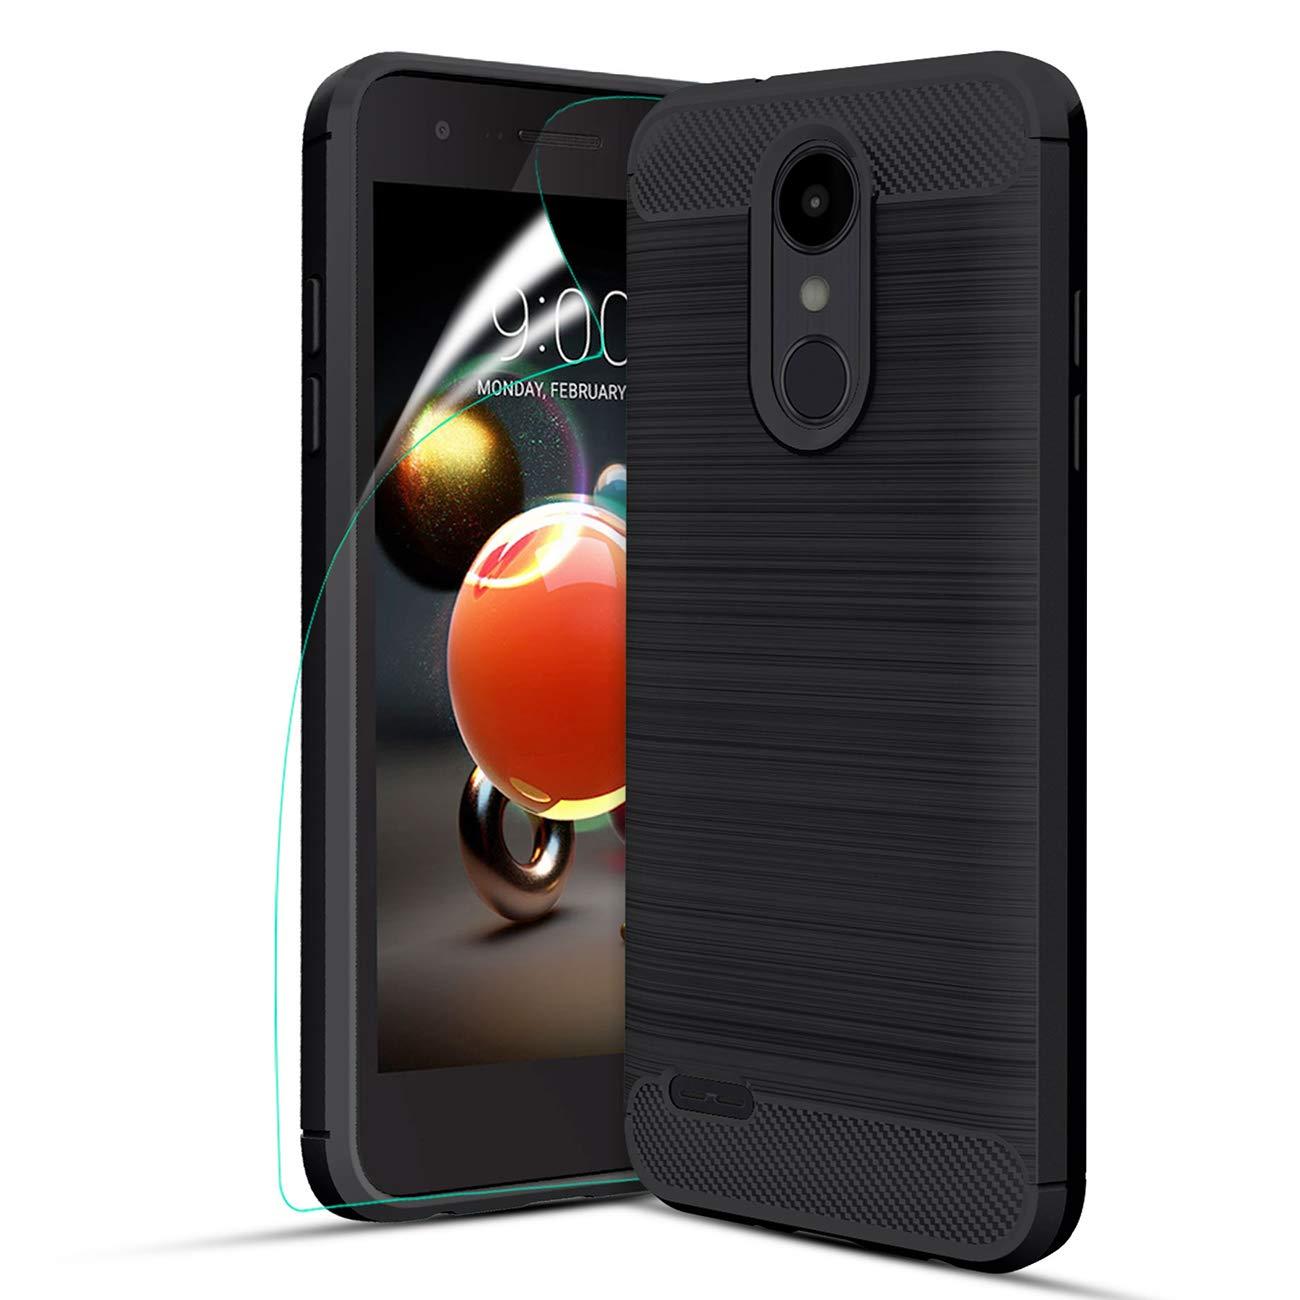 LG Aristo 2 Case,LG Tribute Dynasty/LG Aristo 3/Aristo 2 Plus/Rebel 4/Phoenix 4/LG Tribute Empire/Zone 4/Fortune 2/K8 2018/K8 Plus Case wScreen Protector,Carbon Fiber Brushed TPU Protective Case,Black